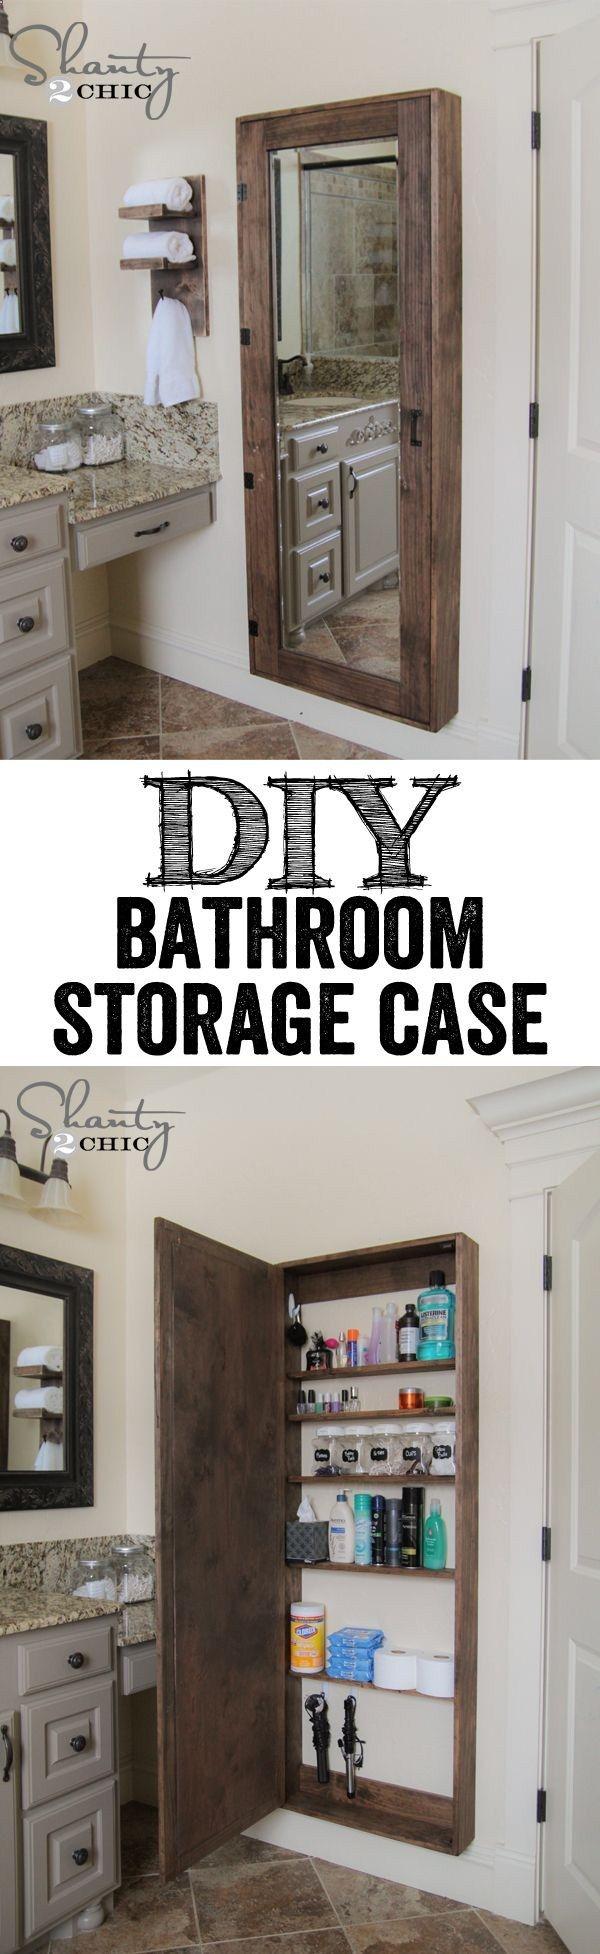 DIY Bathroom Organization Cabinet with full length mirror�. LEGENDARY IDEA!